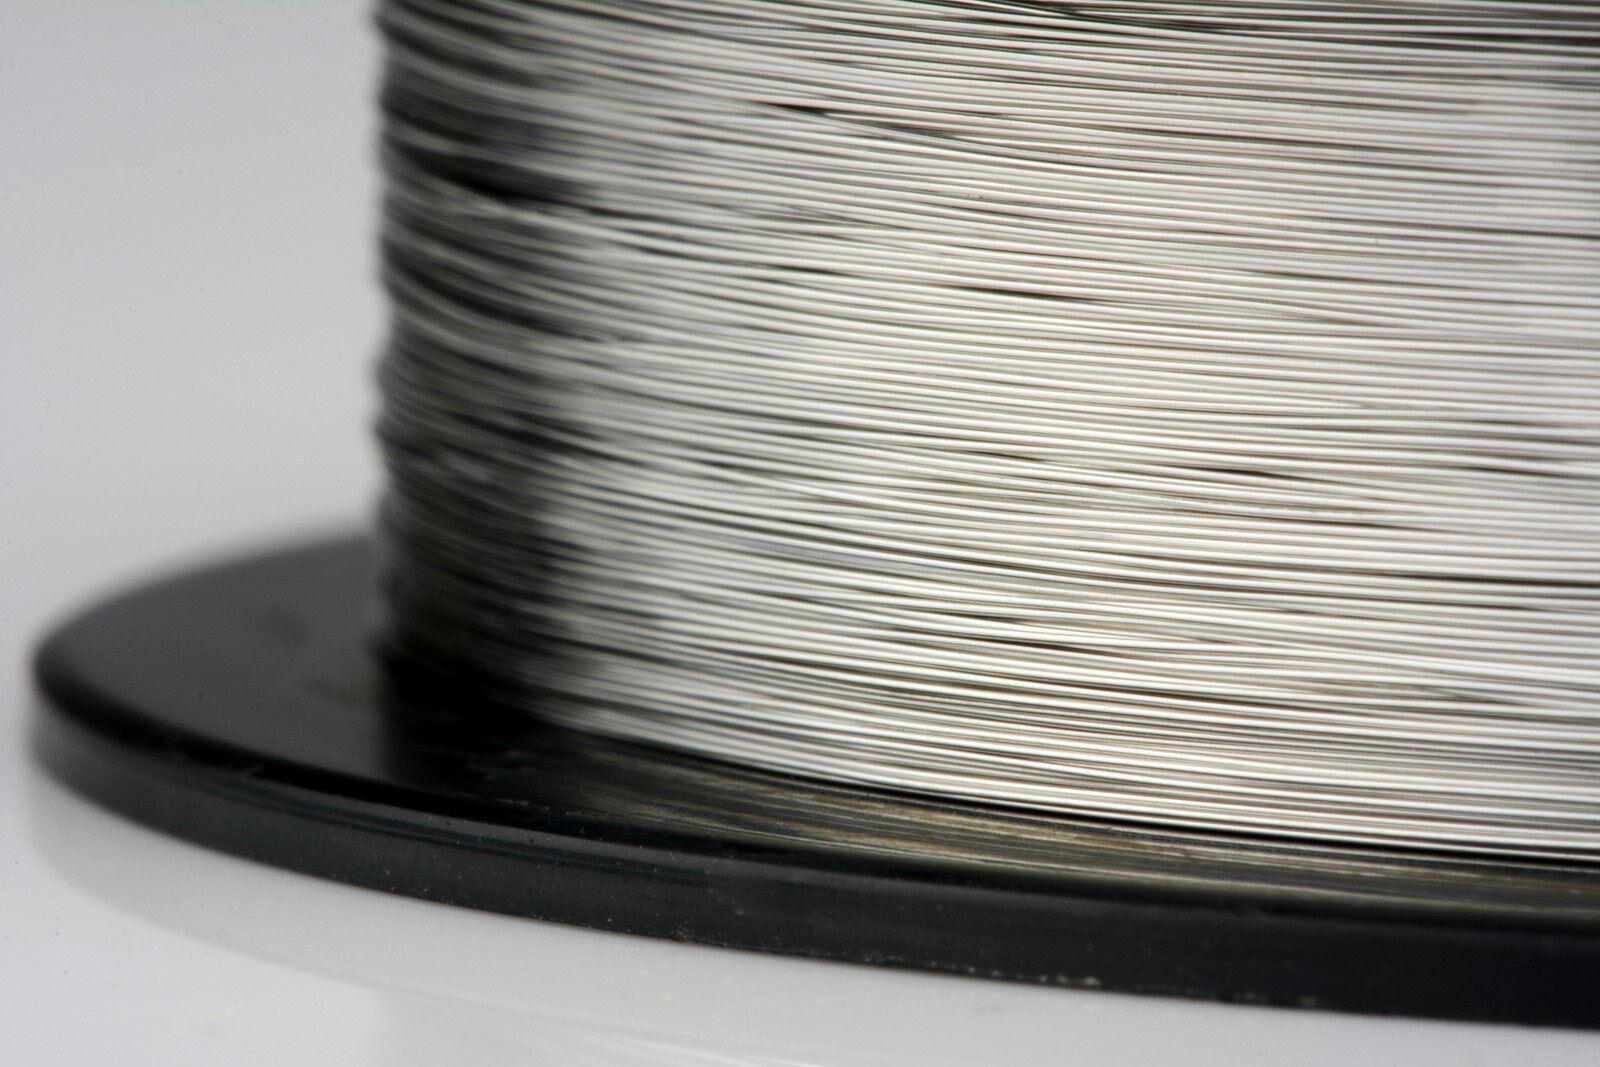 Temco Nichrome 60 Series Wire 34 Gauge 2500 FT Resistance AWG GA | eBay